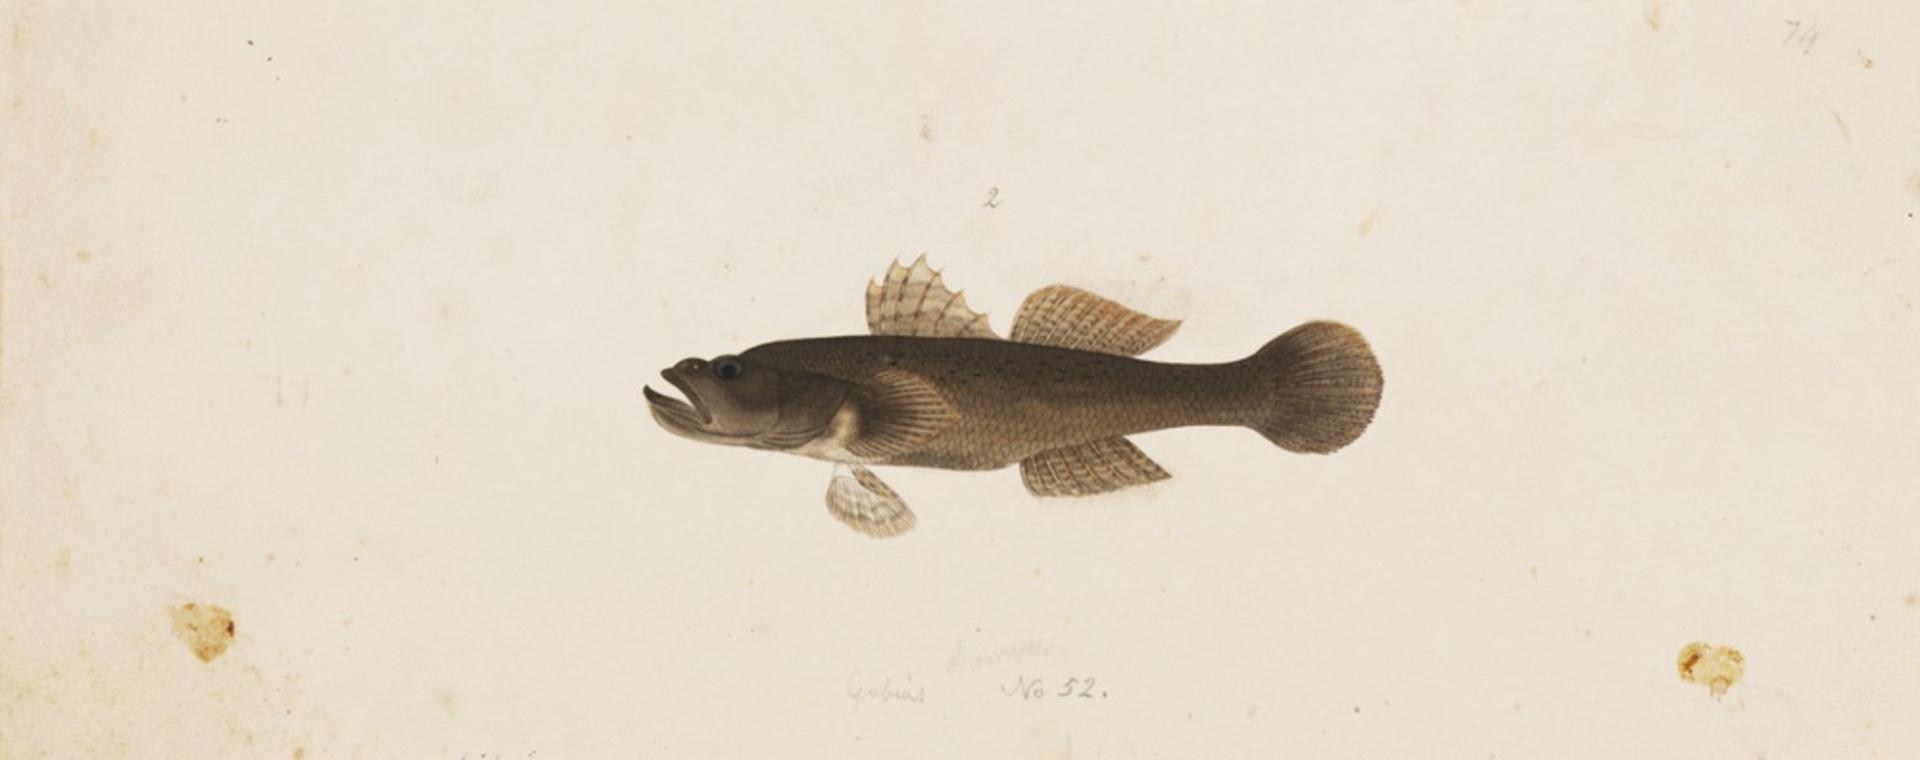 RMNH.ART.759 | Glossogobius olivaceus